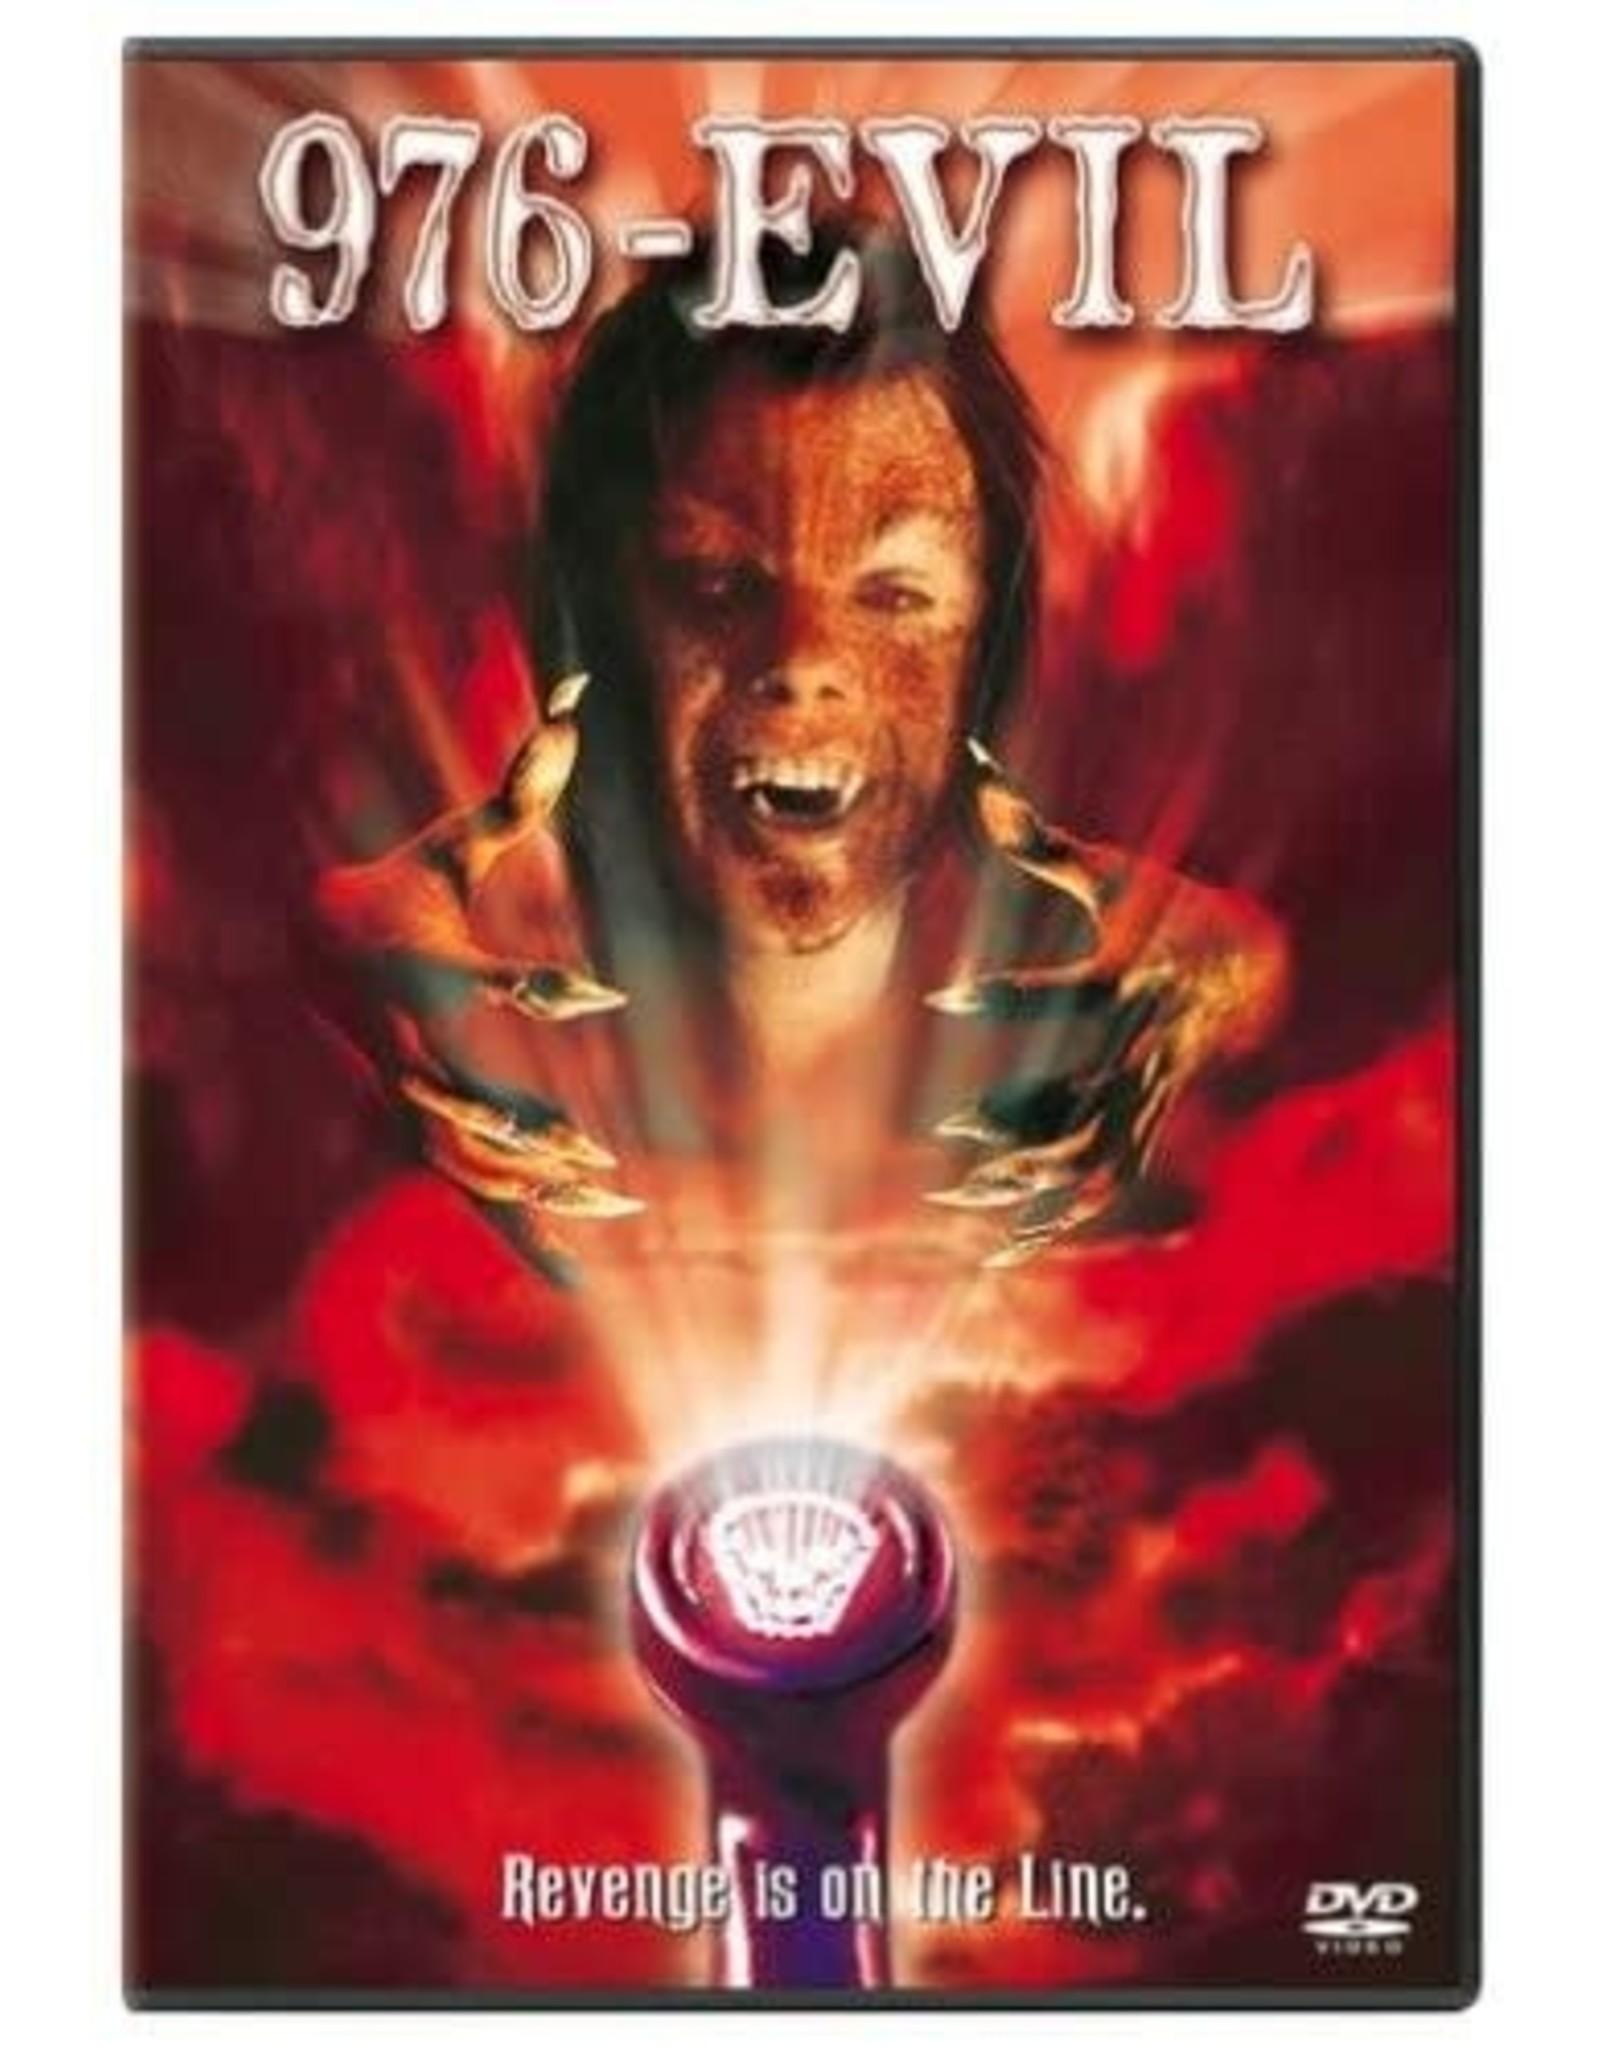 Horror Cult 976-Evil